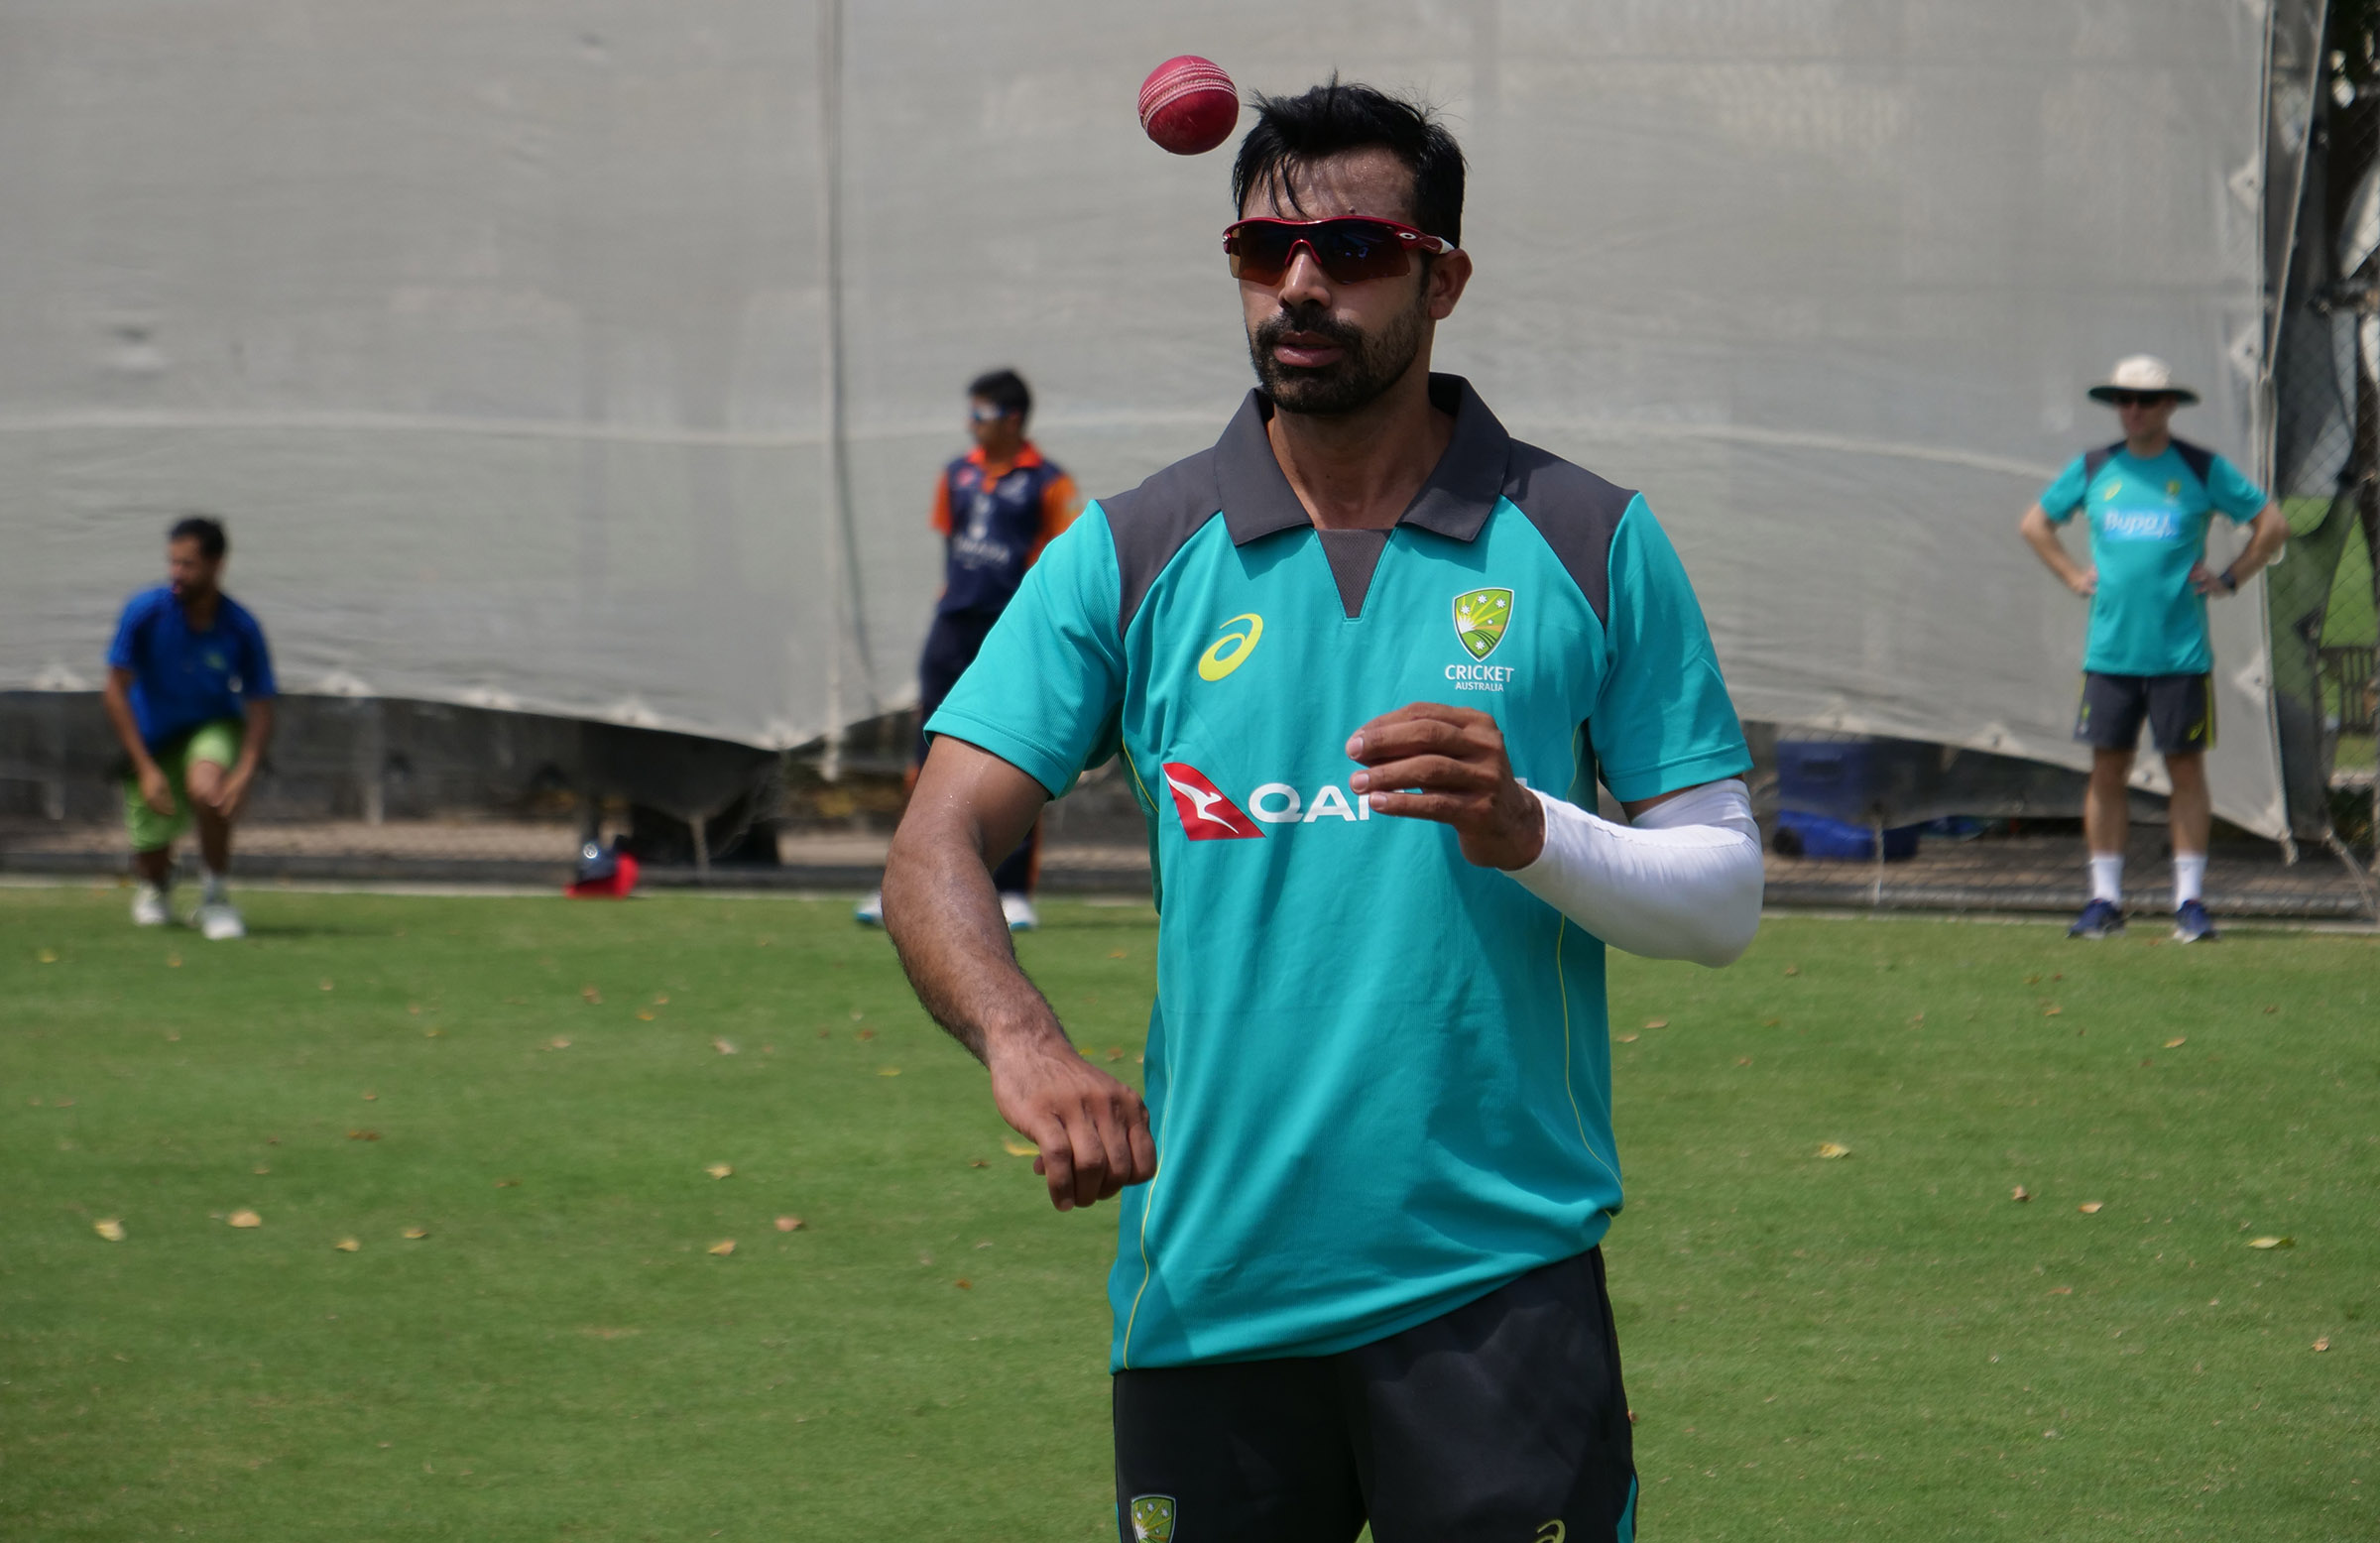 Indian wrist spinner Pardeep Sahu is training with the Australians // cricket.com.au